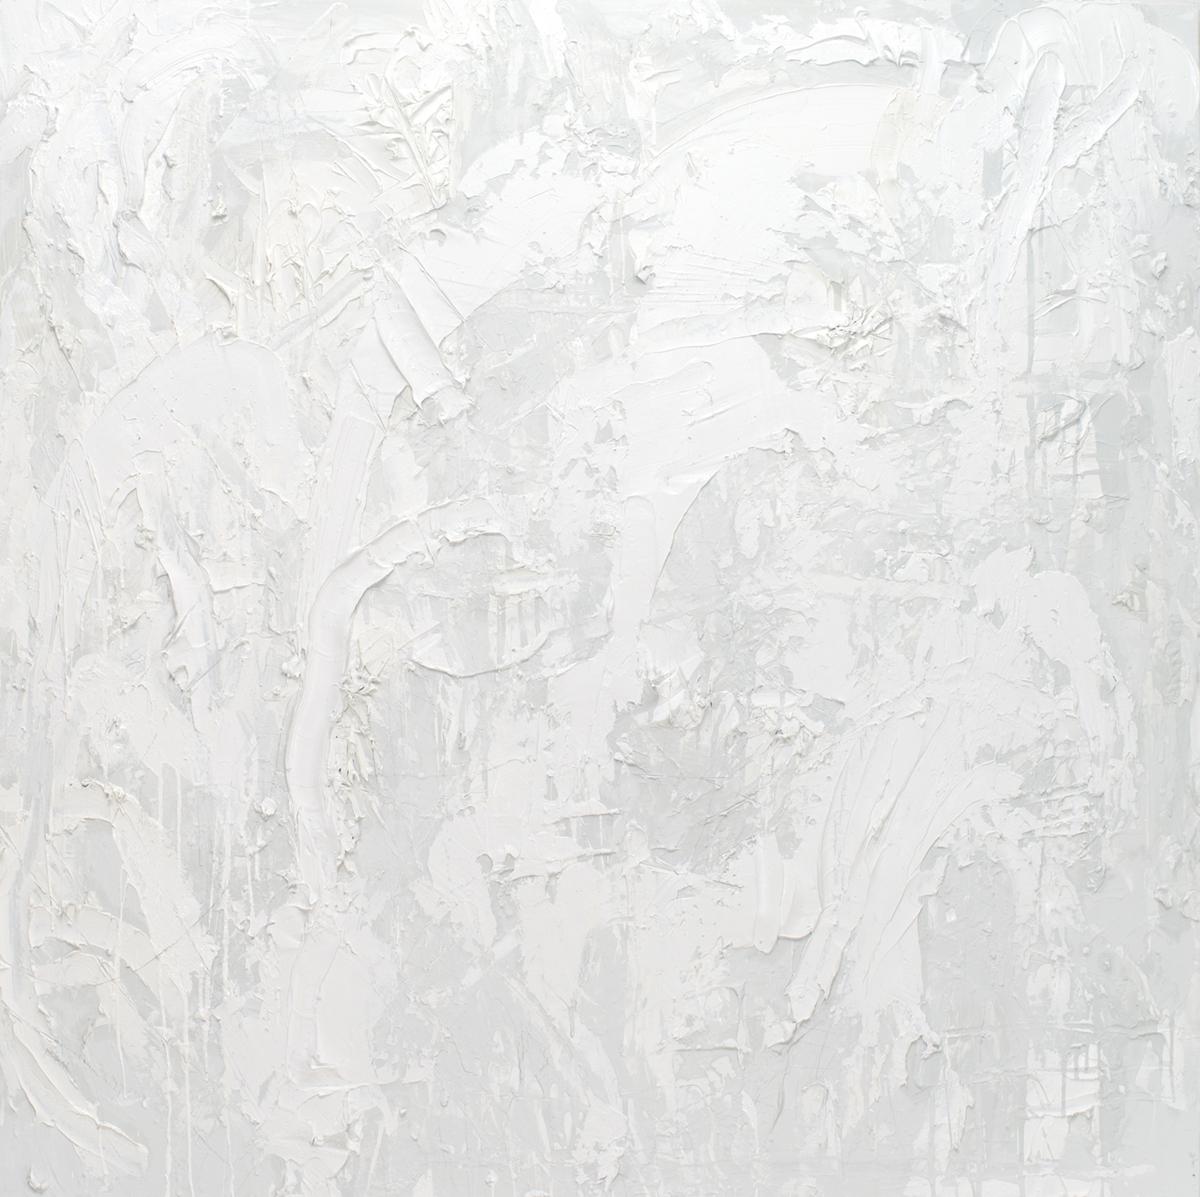 untitled (white flake hue)